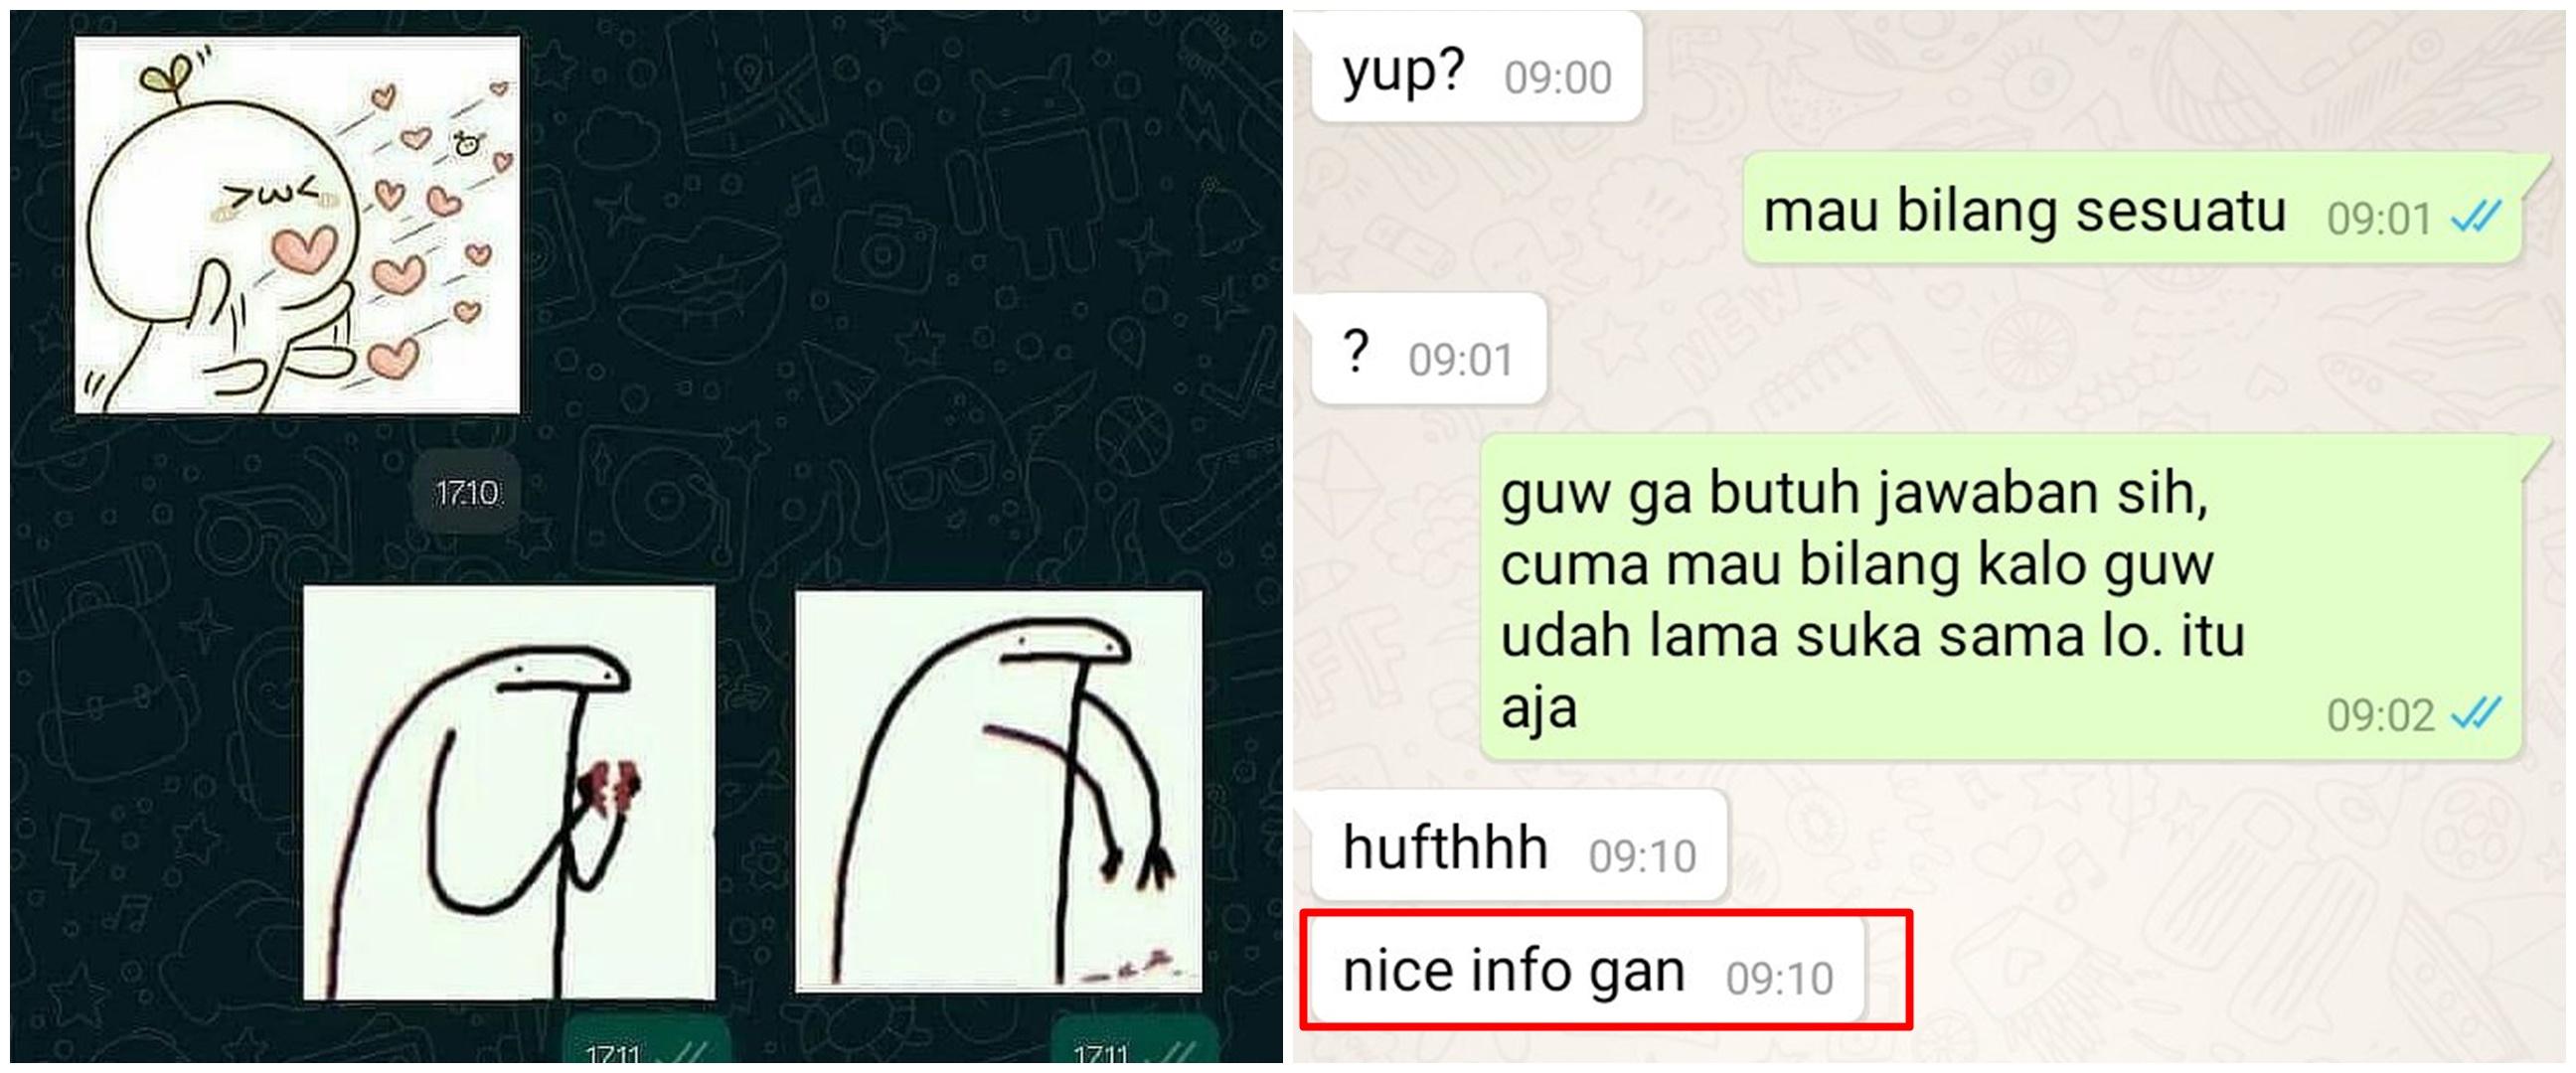 10 Balasan chat PDKT di luar ekspektasi, bikin cowok senyum pedih